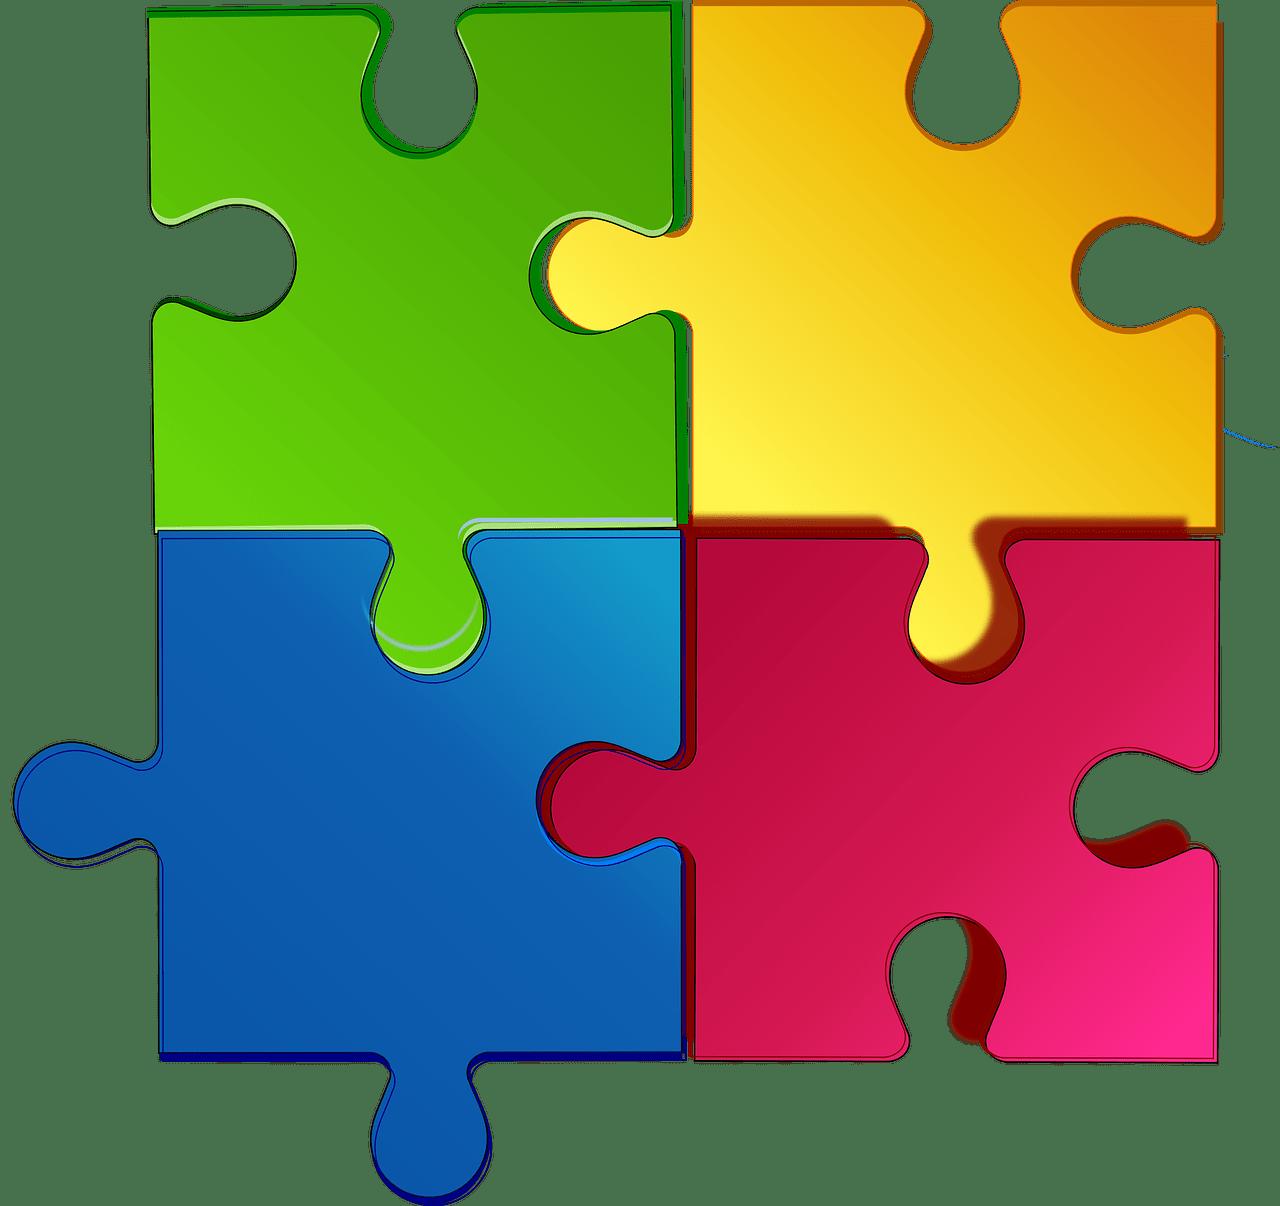 Pixabay - Jigsaw interconnections